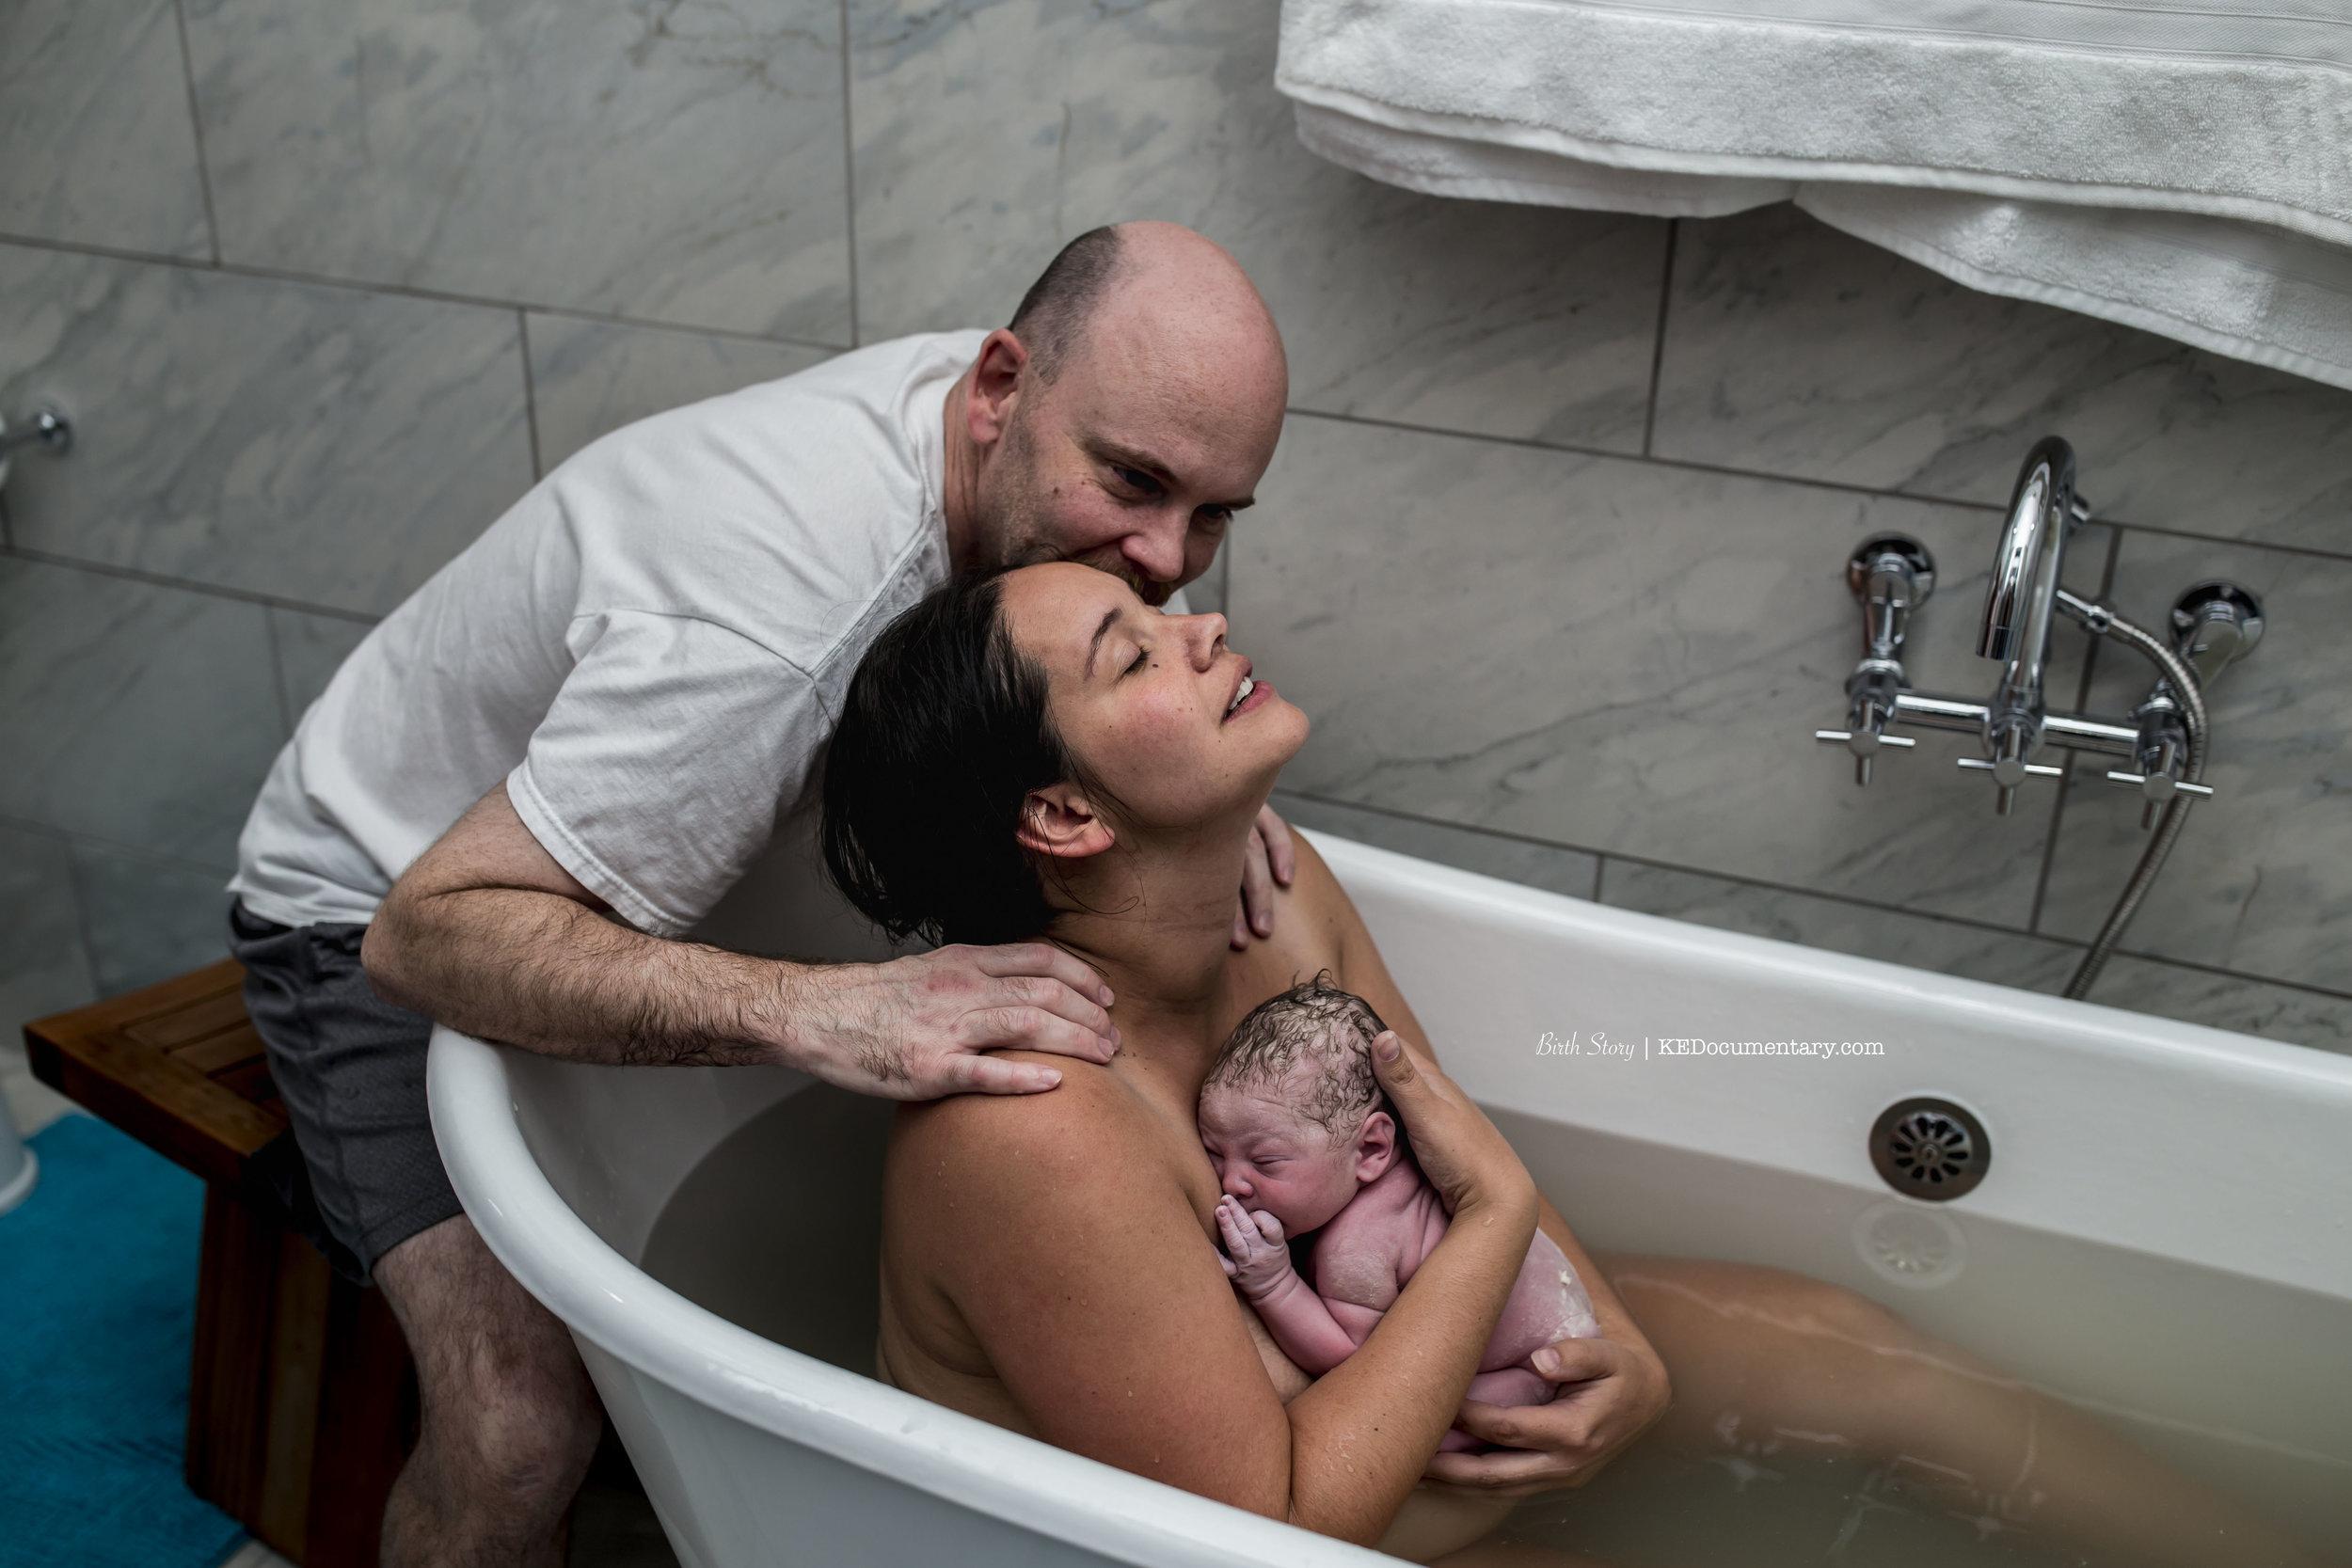 Plano Birth Story - Plano BirthPlace